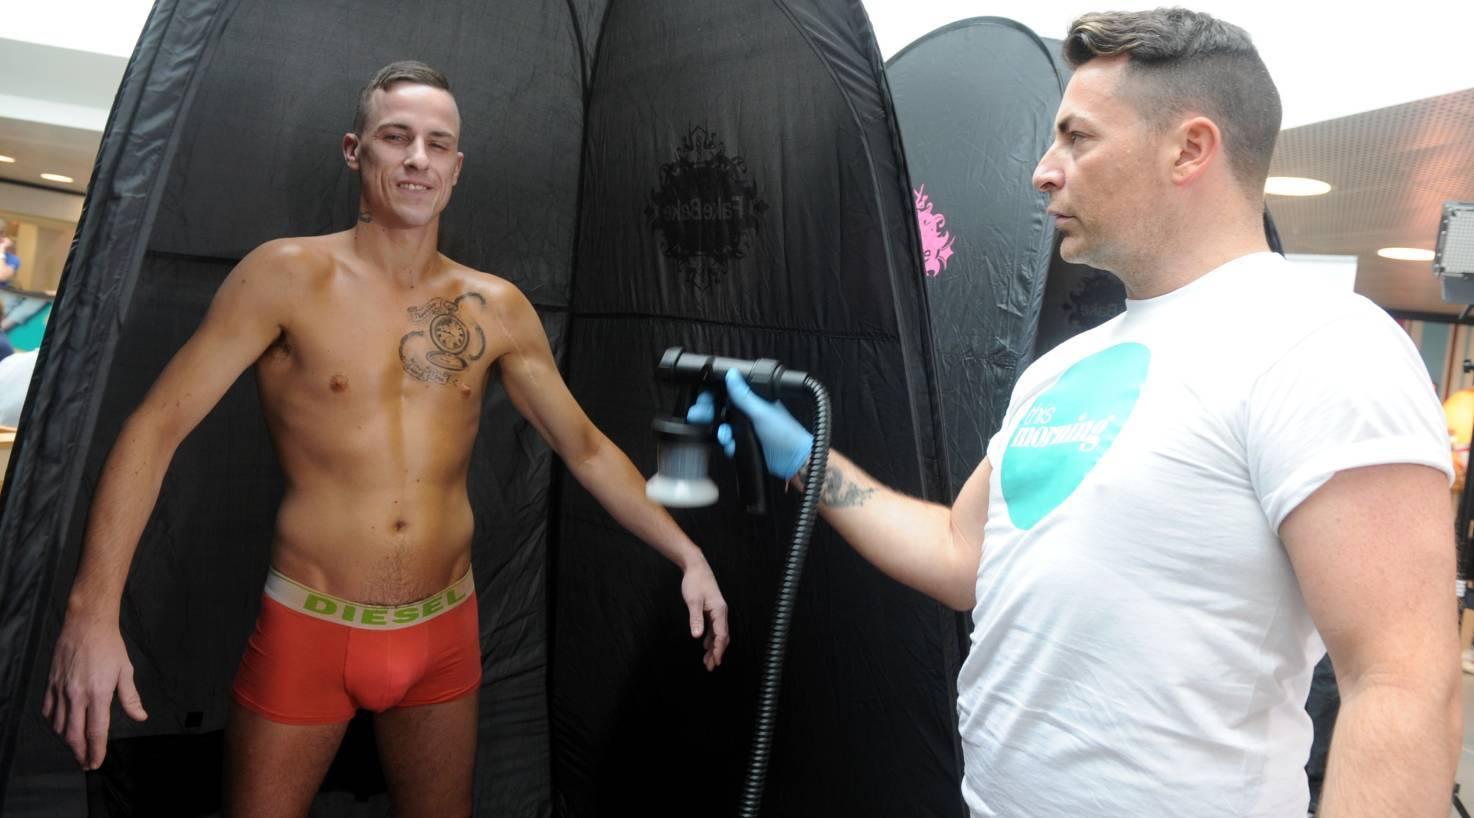 William Kinnaird gets sprayed by Craig-Alexander Wilson at the Bon Accord Centre.